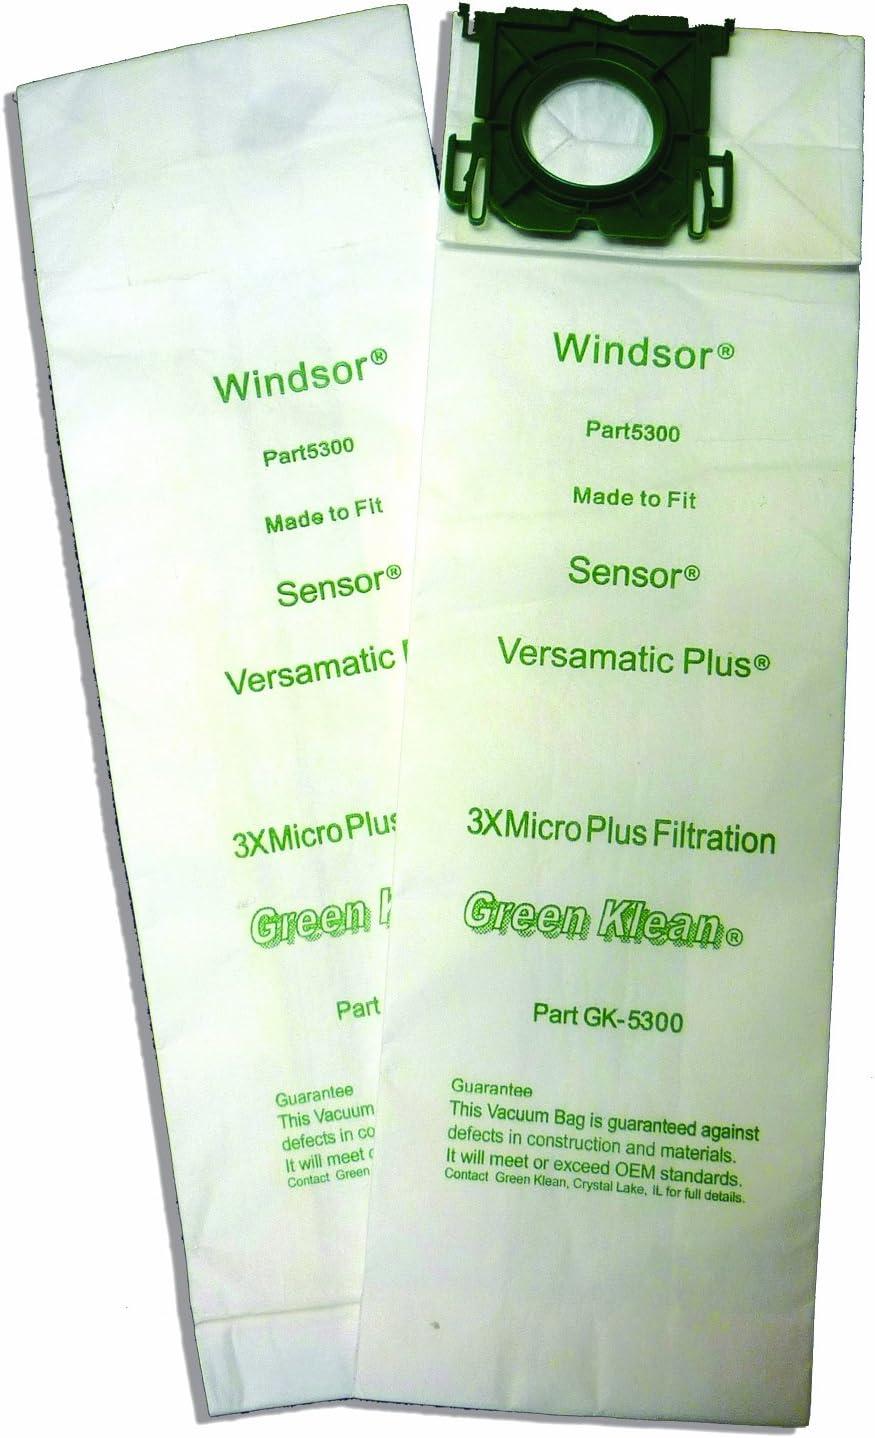 Green Klean 5300 8.600-050.0 2050102000 Windsor New arrival Sensor Regular store Versam